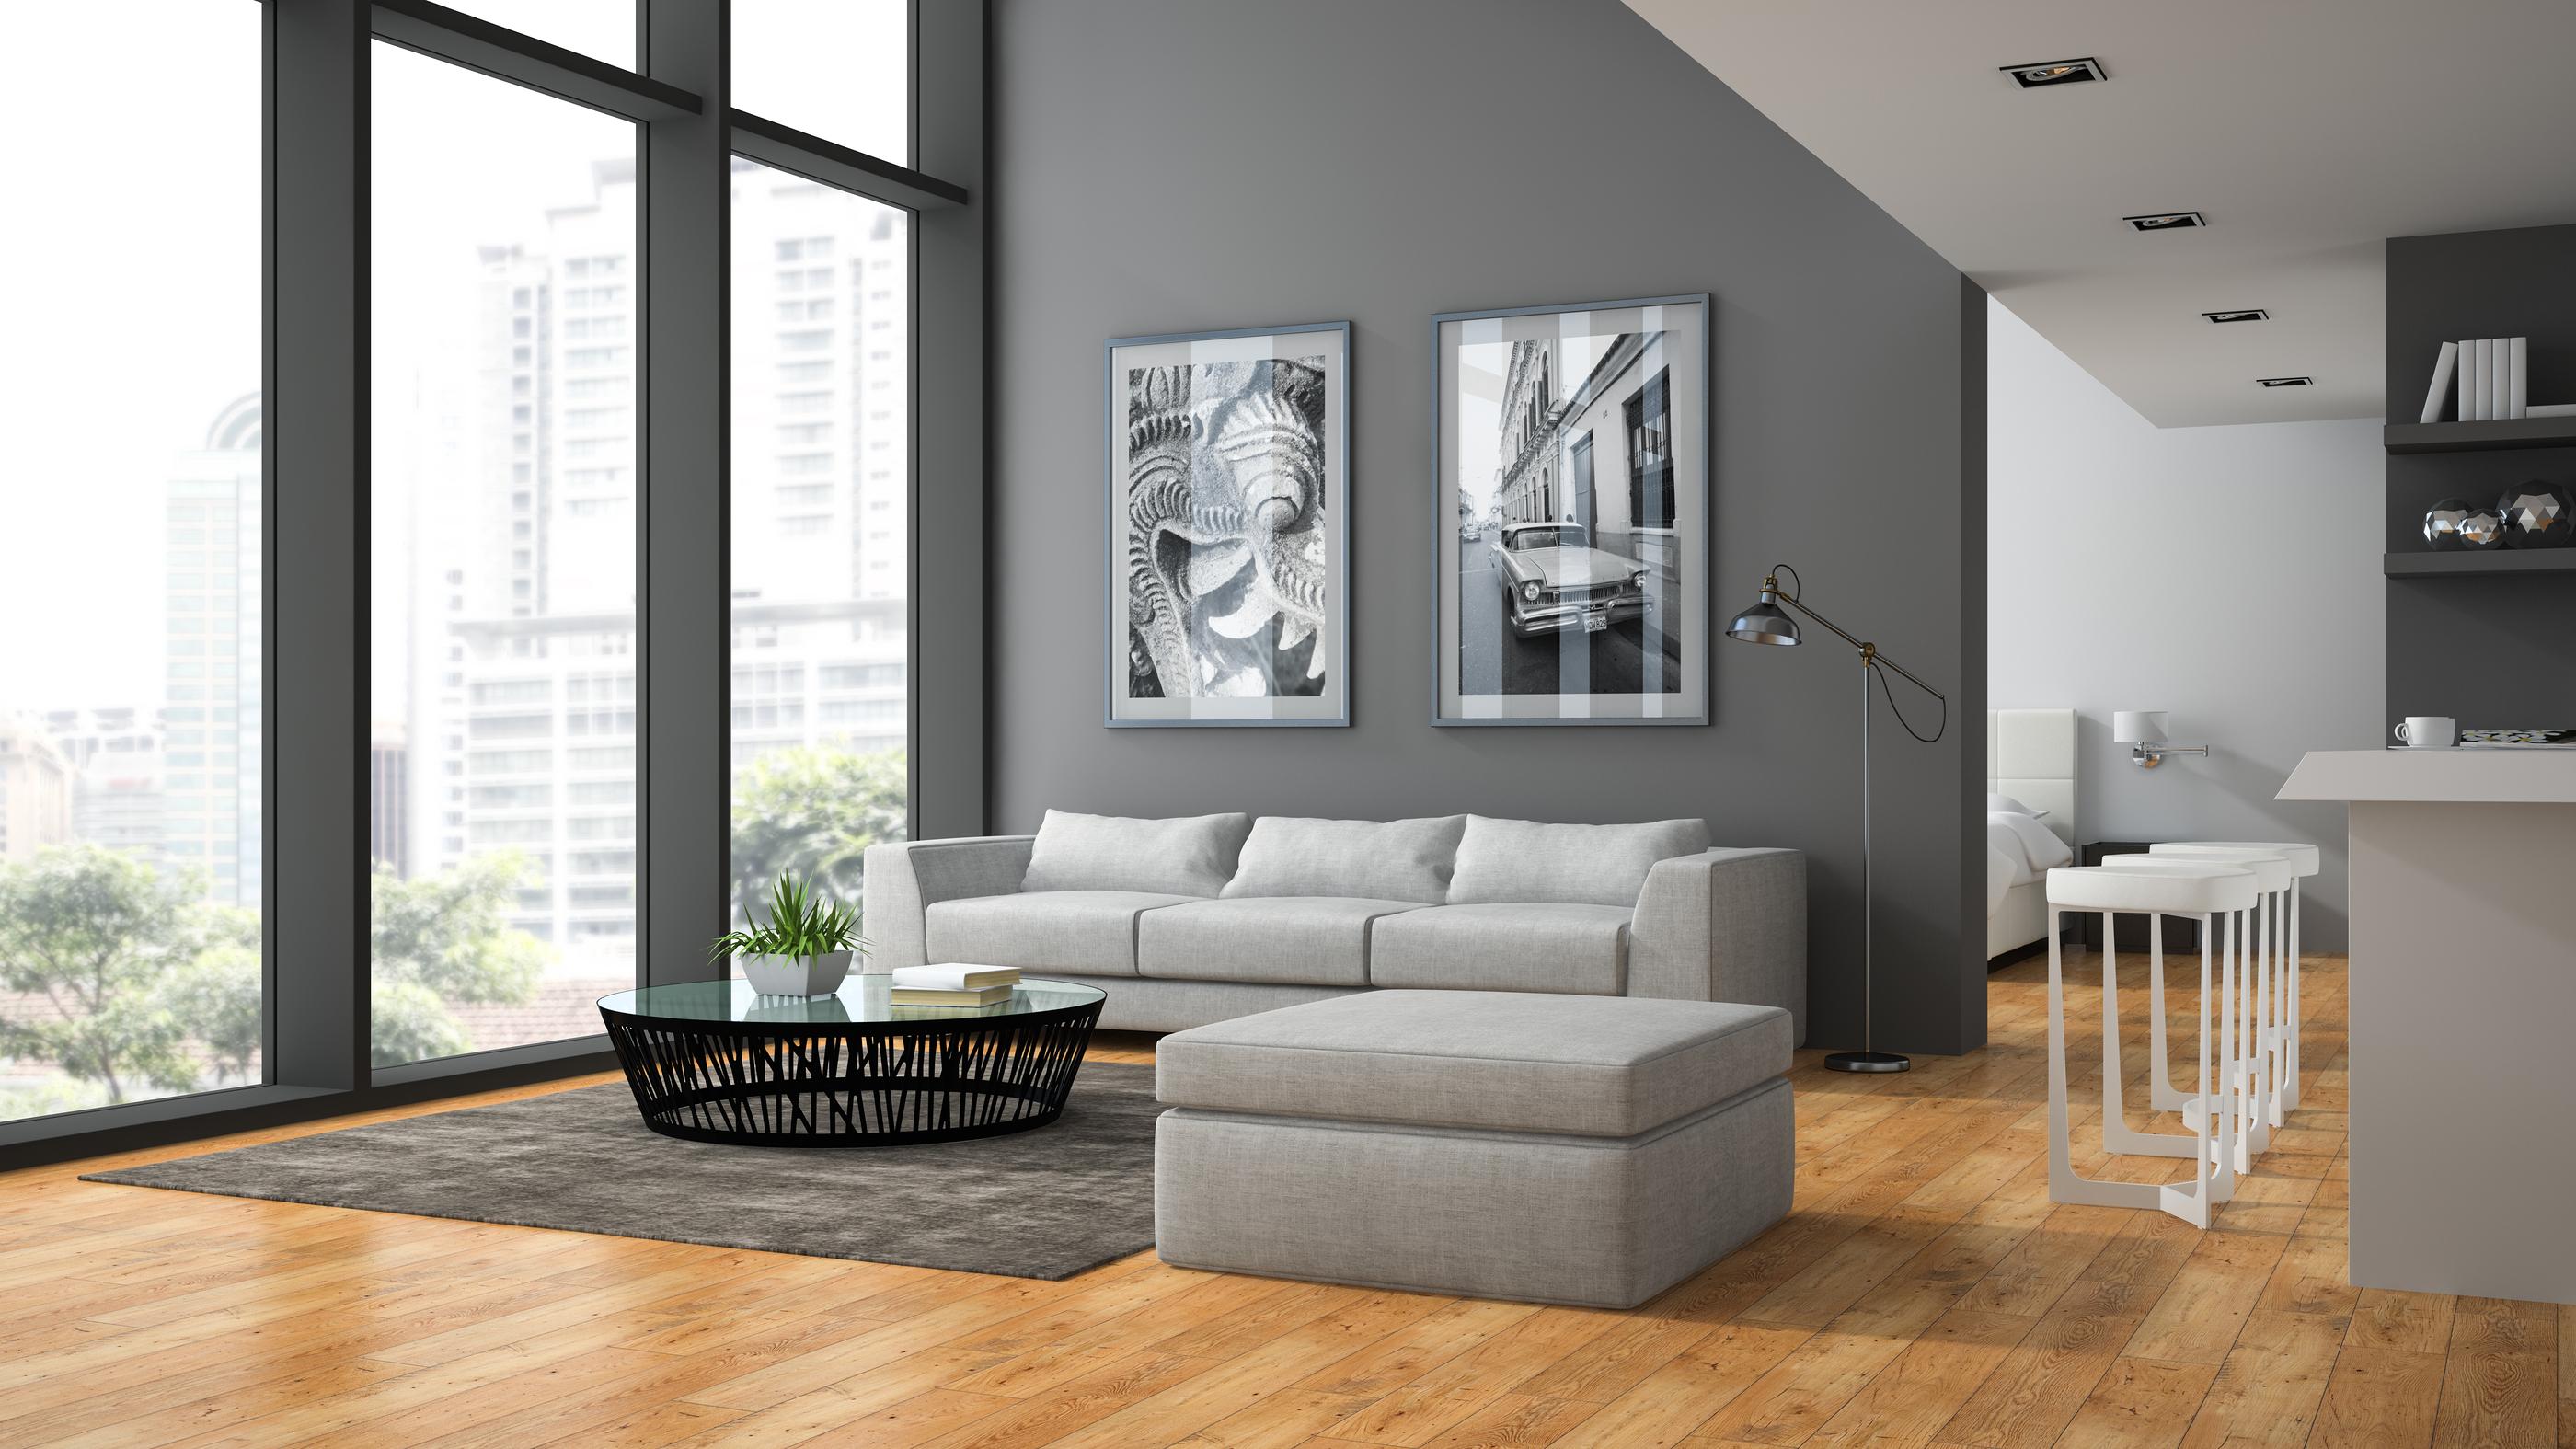 Interior of the modern design  loft with parquet floor 3D rendering